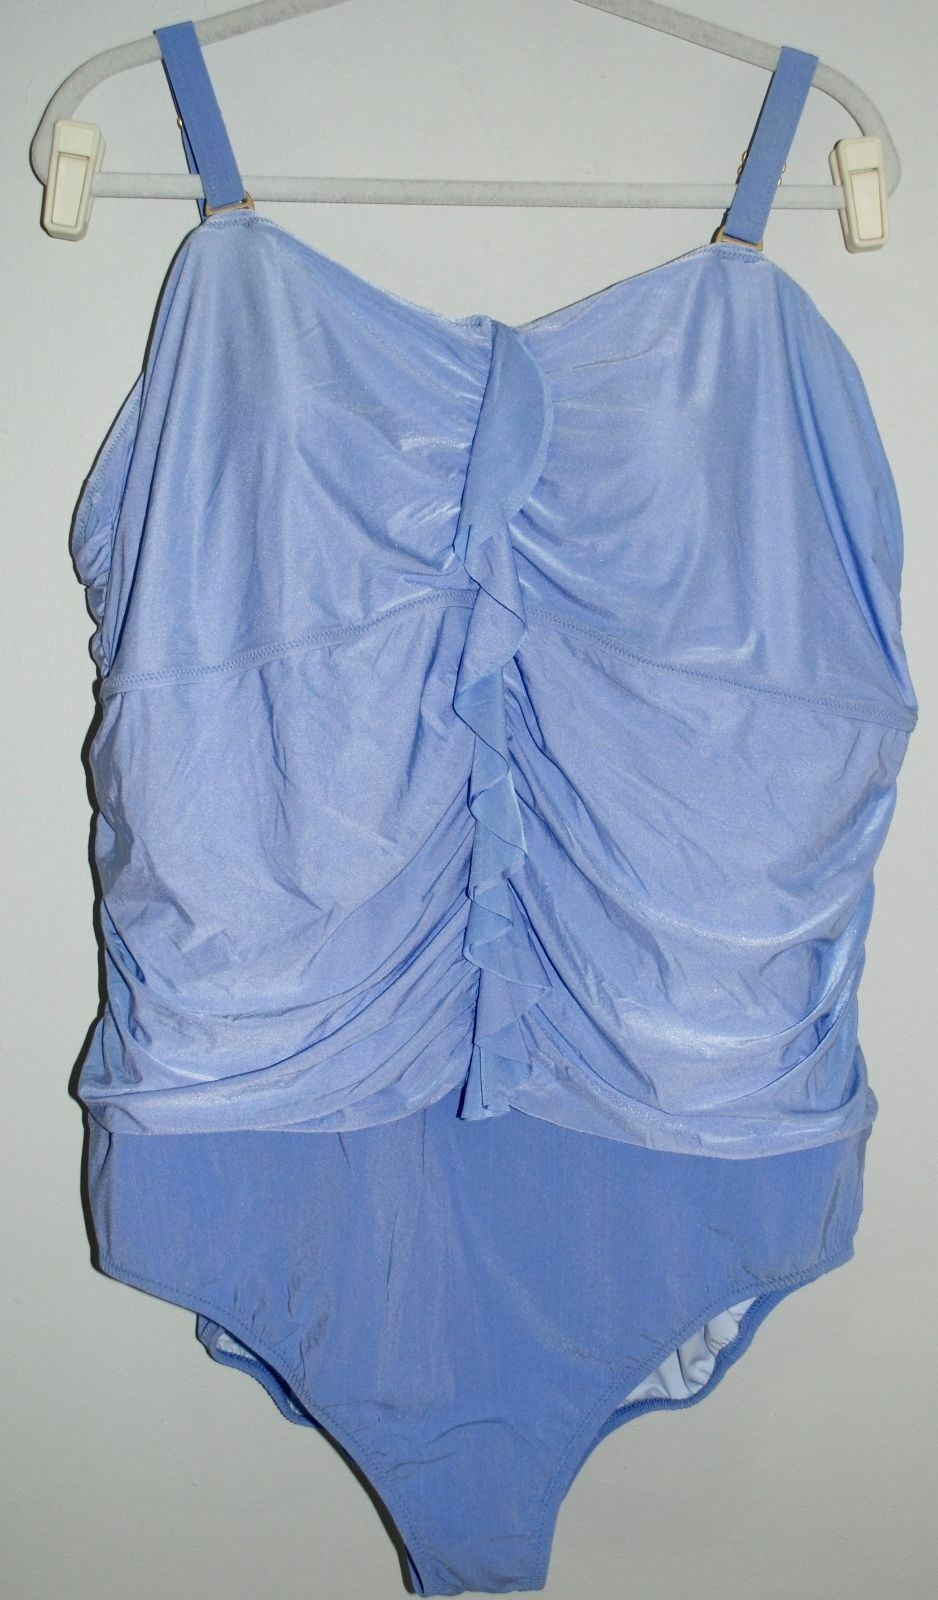 Lands End One Piece Swimsuit - bluee - Plus Size 26W - Blouson Ruched